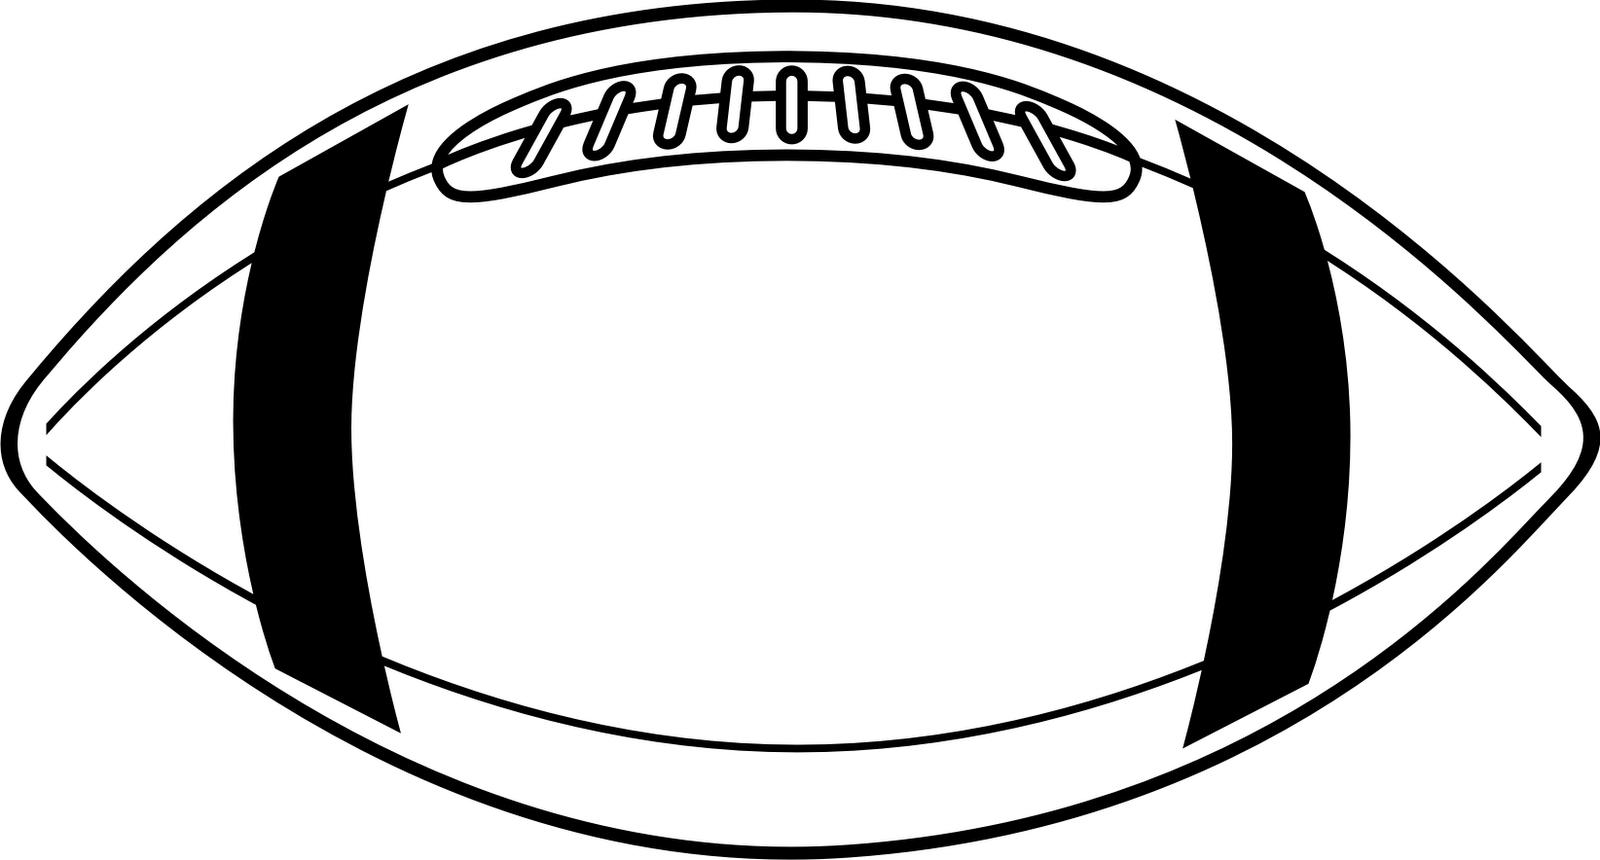 Clip art for football banner black and white stock Football Outline Clip Art & Football Outline Clip Art Clip Art ... banner black and white stock